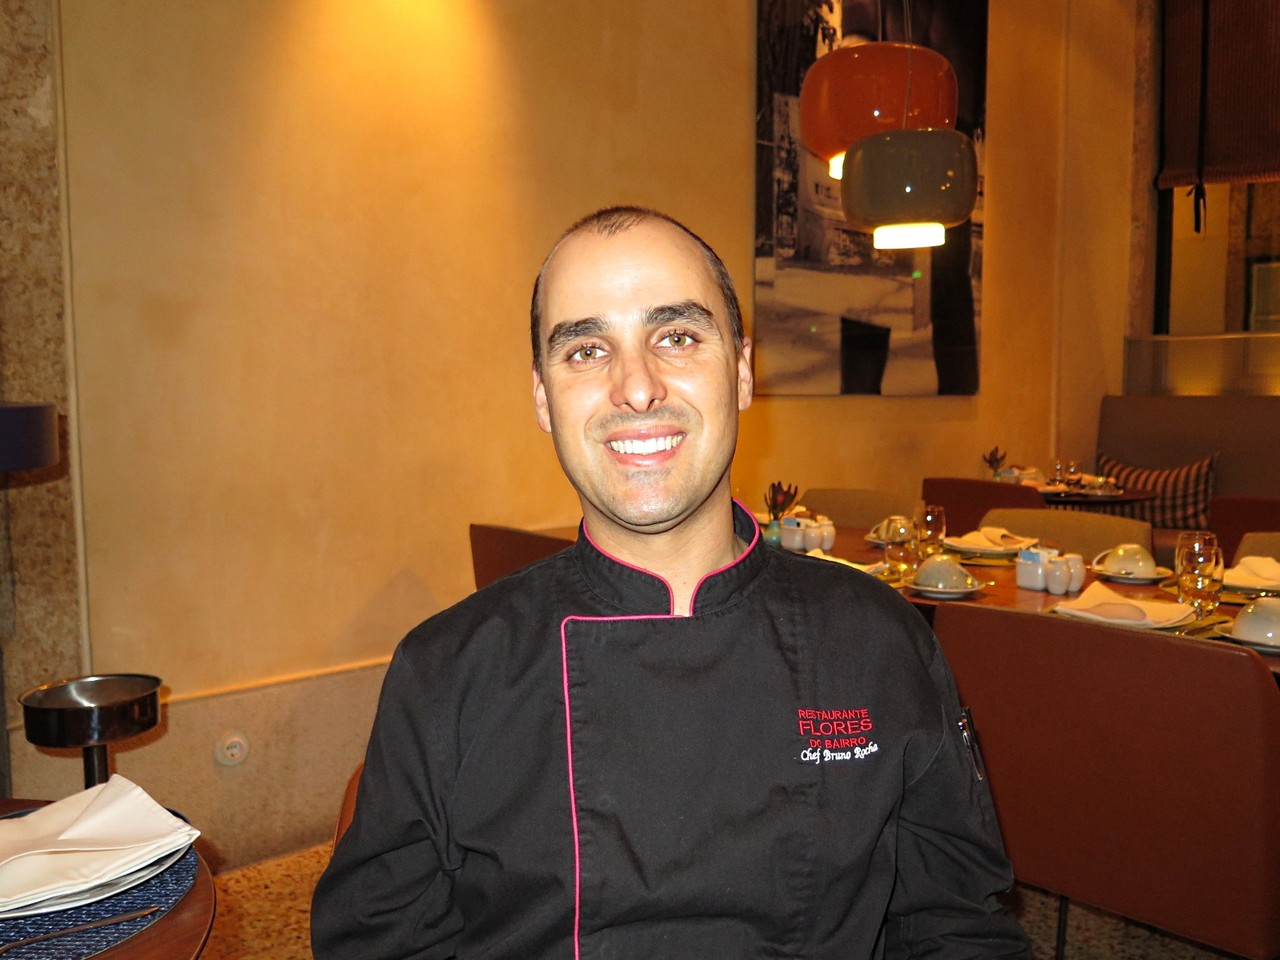 Bruno Rocha na sala do FLORES DO BAIRRO, no Bairro Alto Hotel